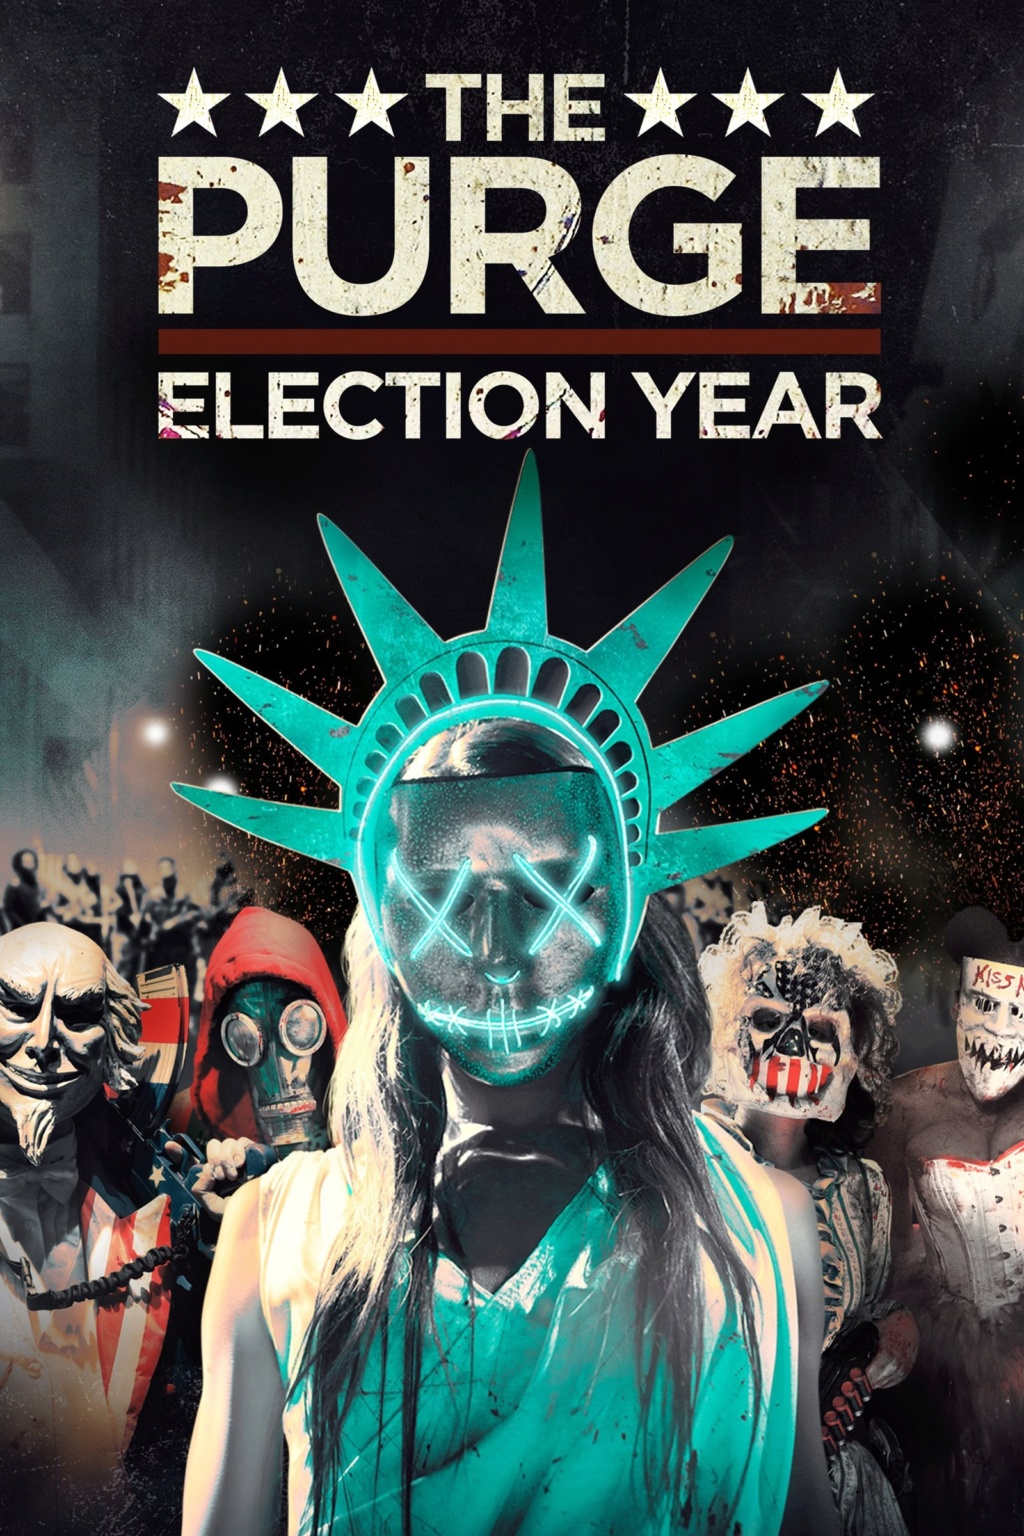 تحميل و مشاهدة فيلم The Purge Election Year 2016 مترجم بجودة